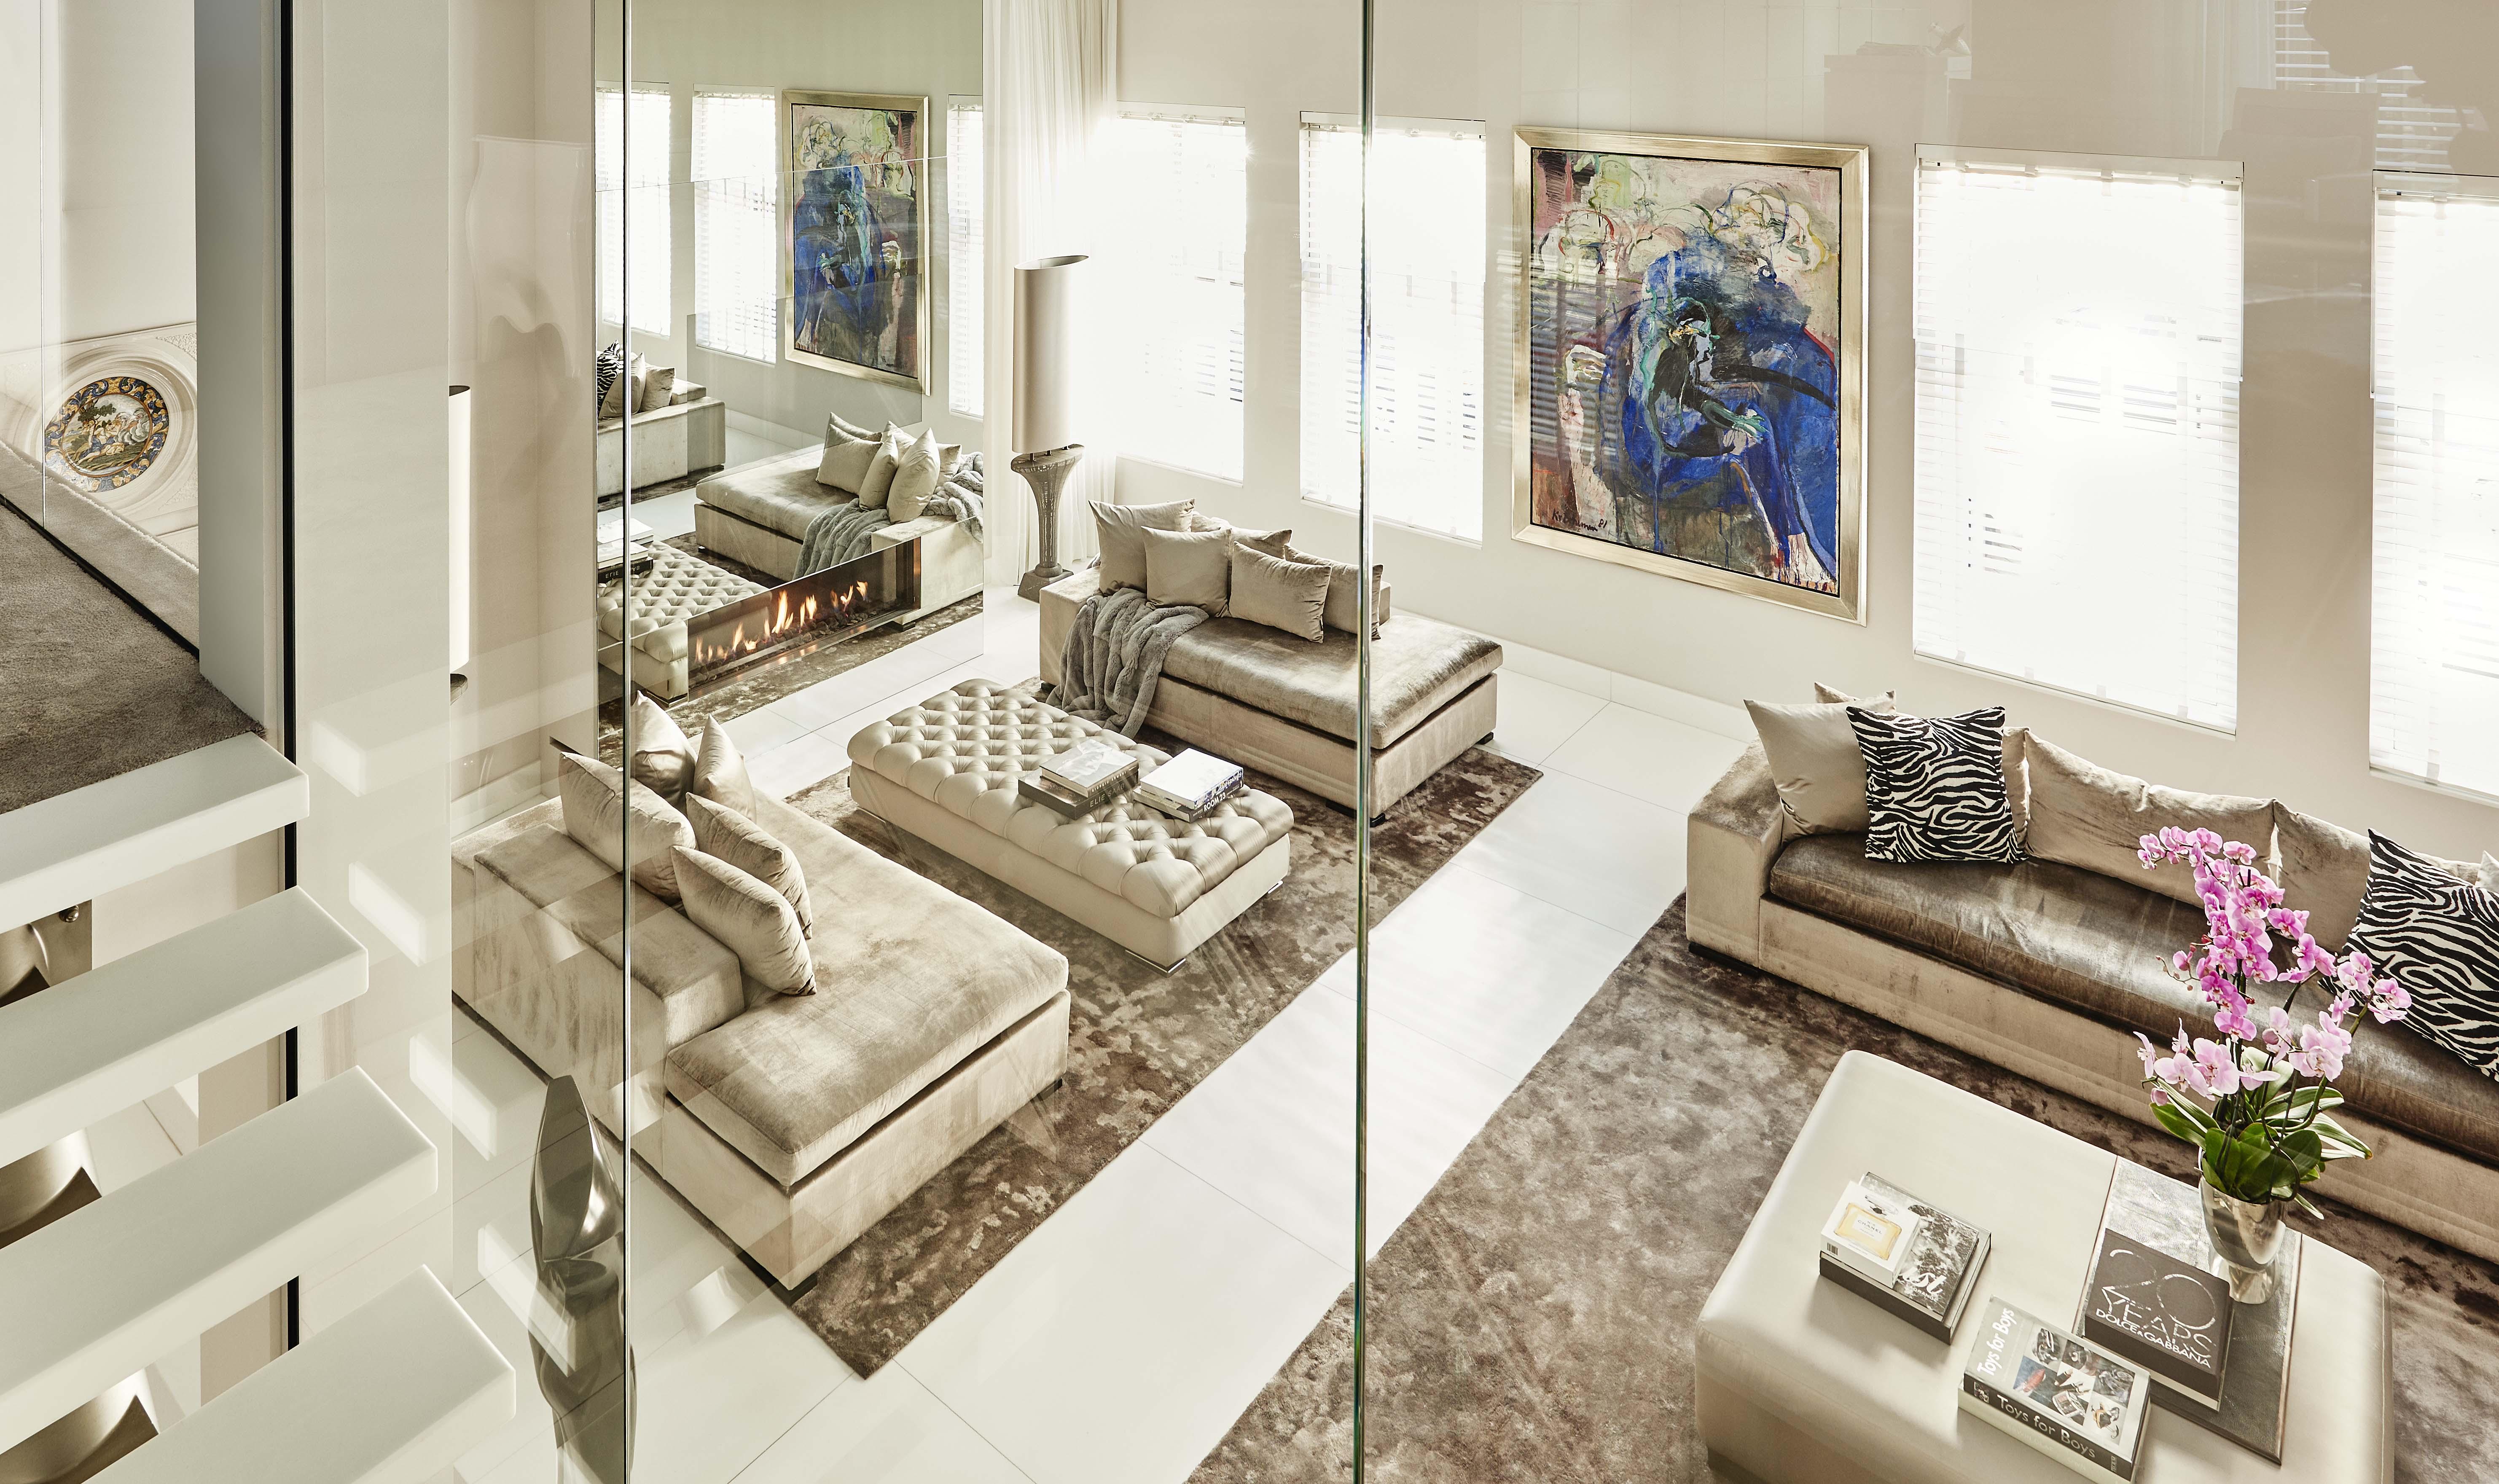 Amsterdam Interior by Eric Kuster | Courtesy of Haute Living